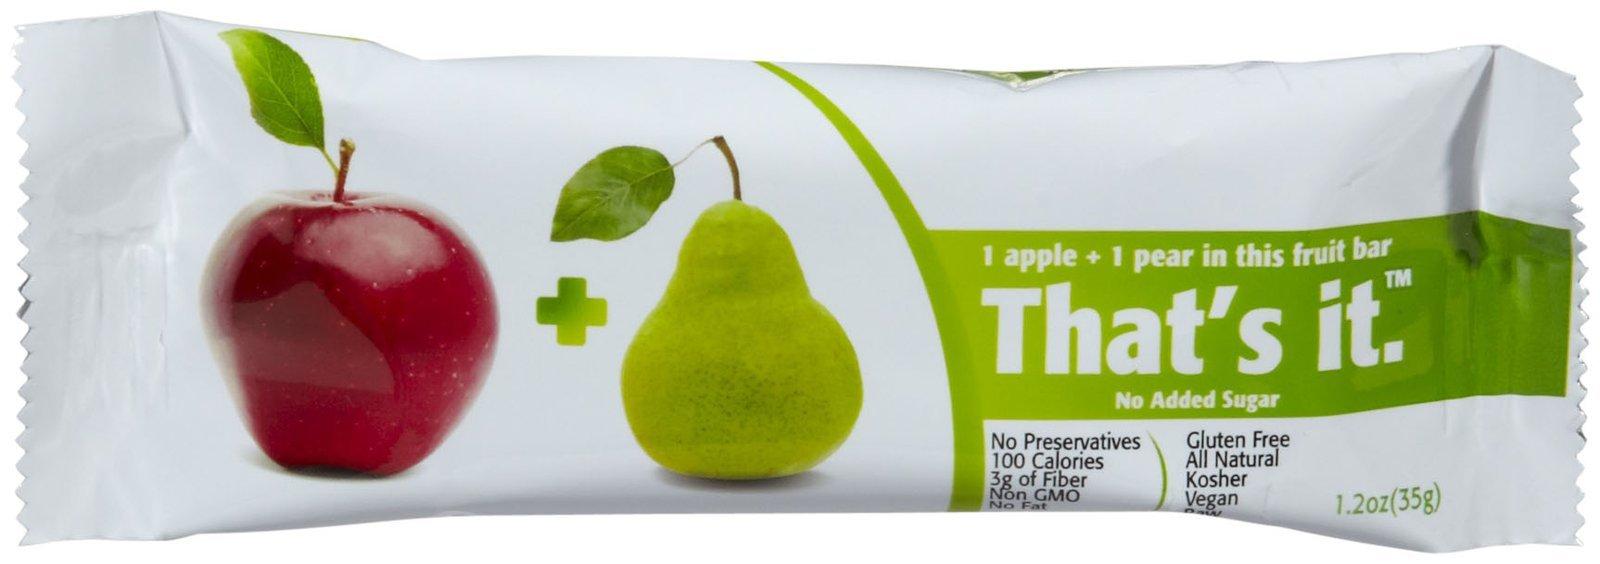 That's It Fruit Bars - Apple & Pear - 1.2 oz